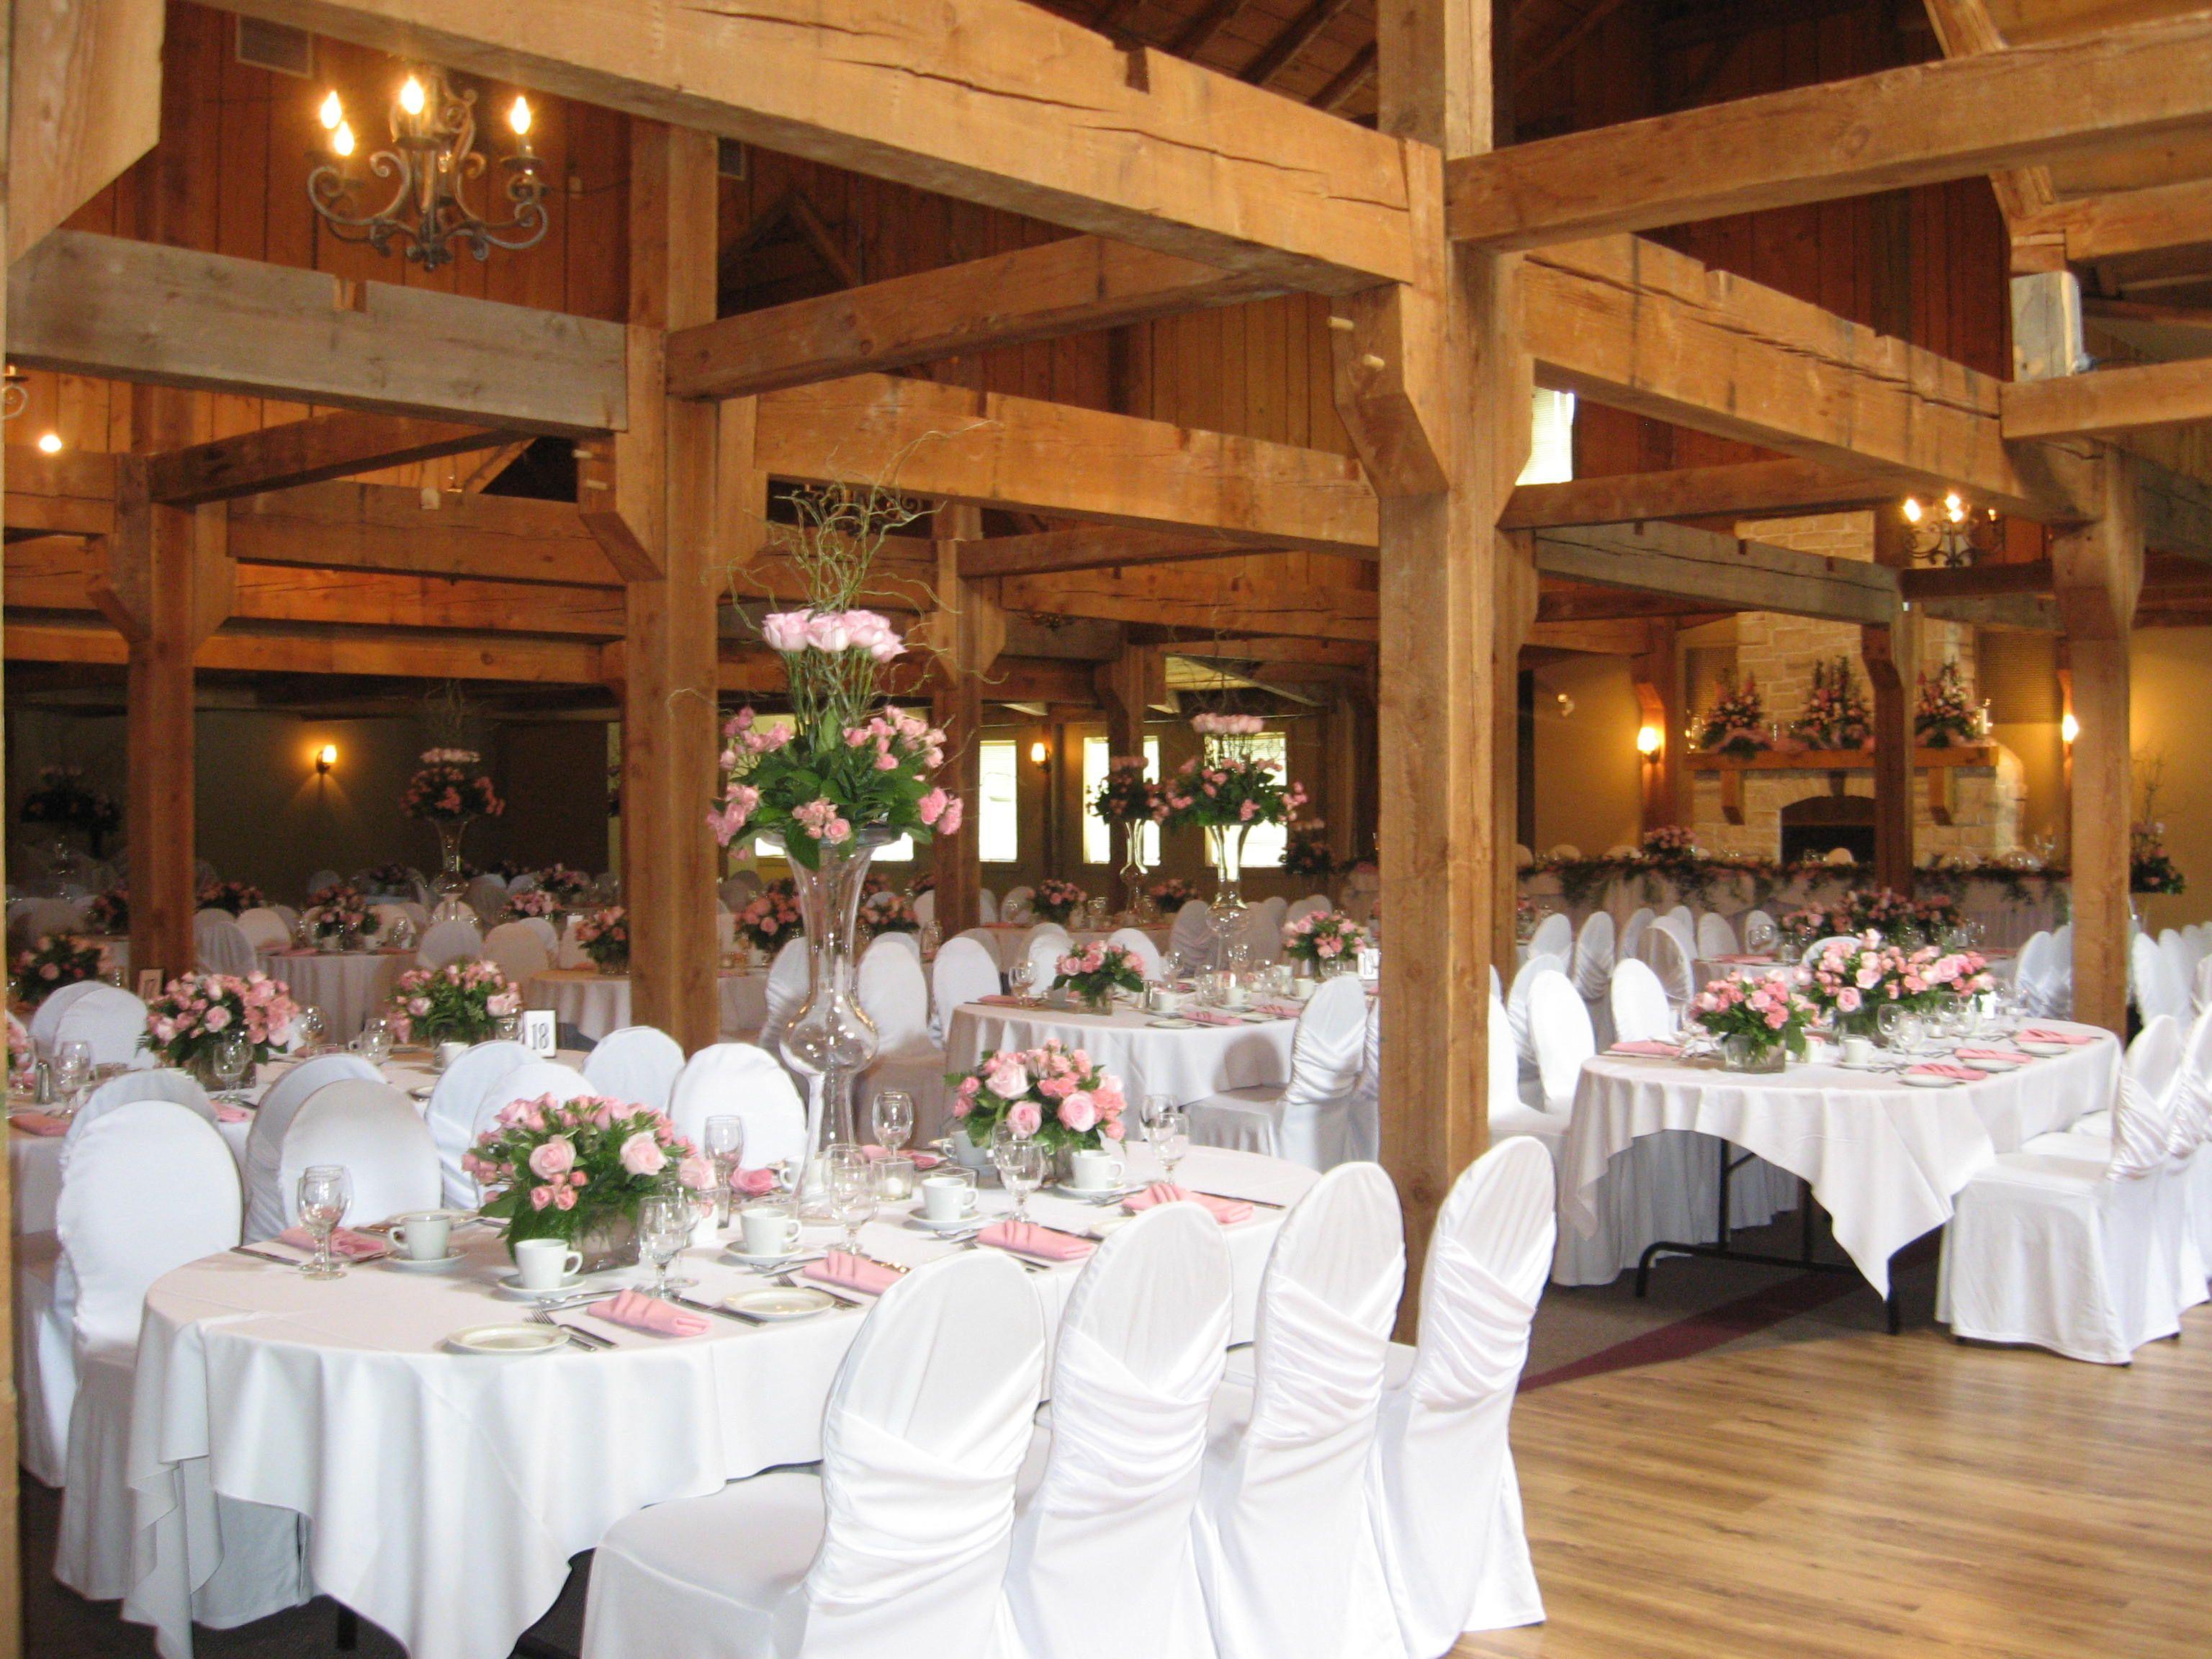 Wedding at Bellamere Winery | Wedding venues, Wedding ...